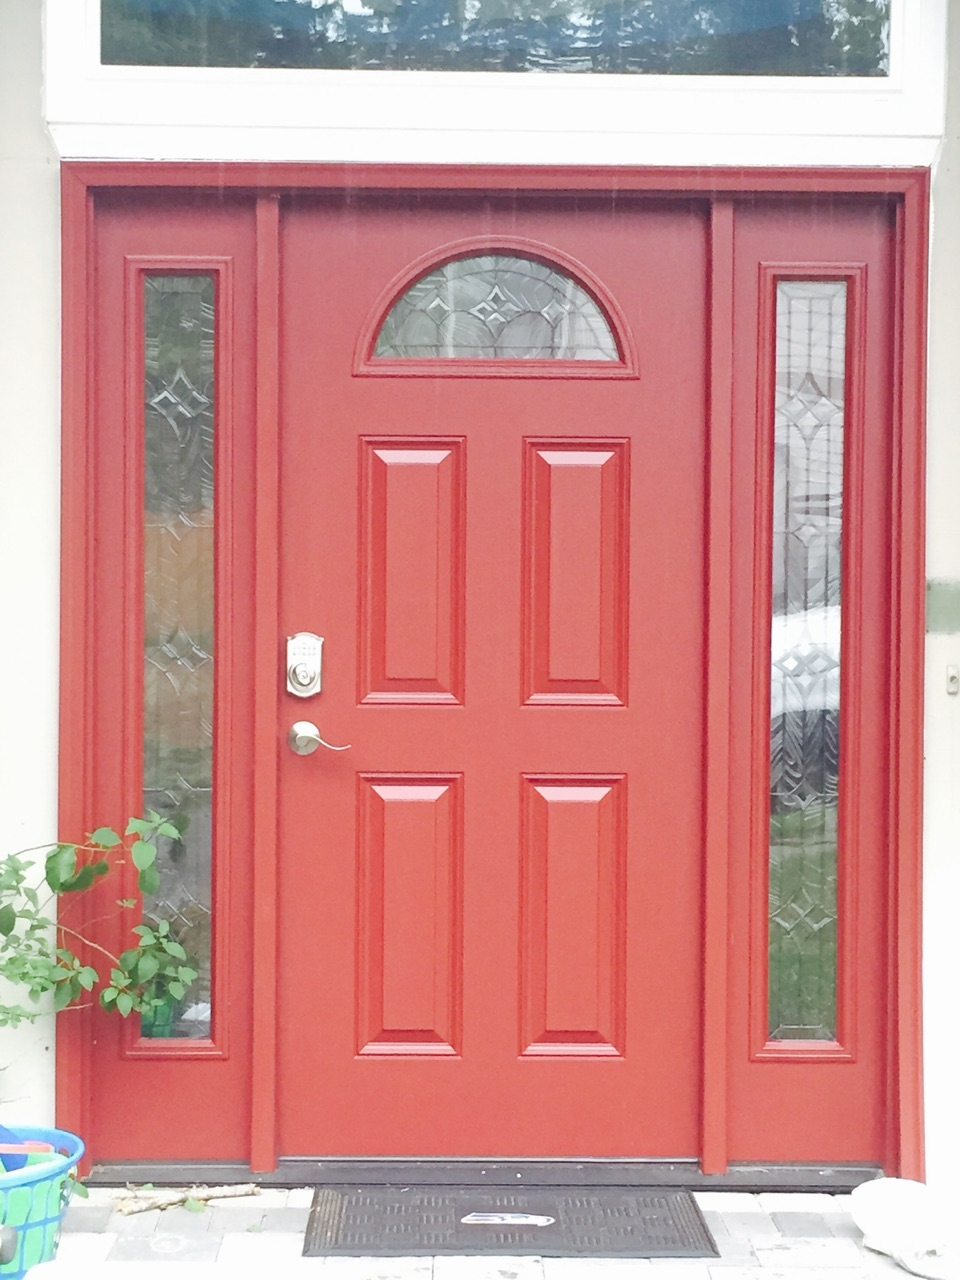 Slideright window and door snohomish washington wa for Local windows and doors